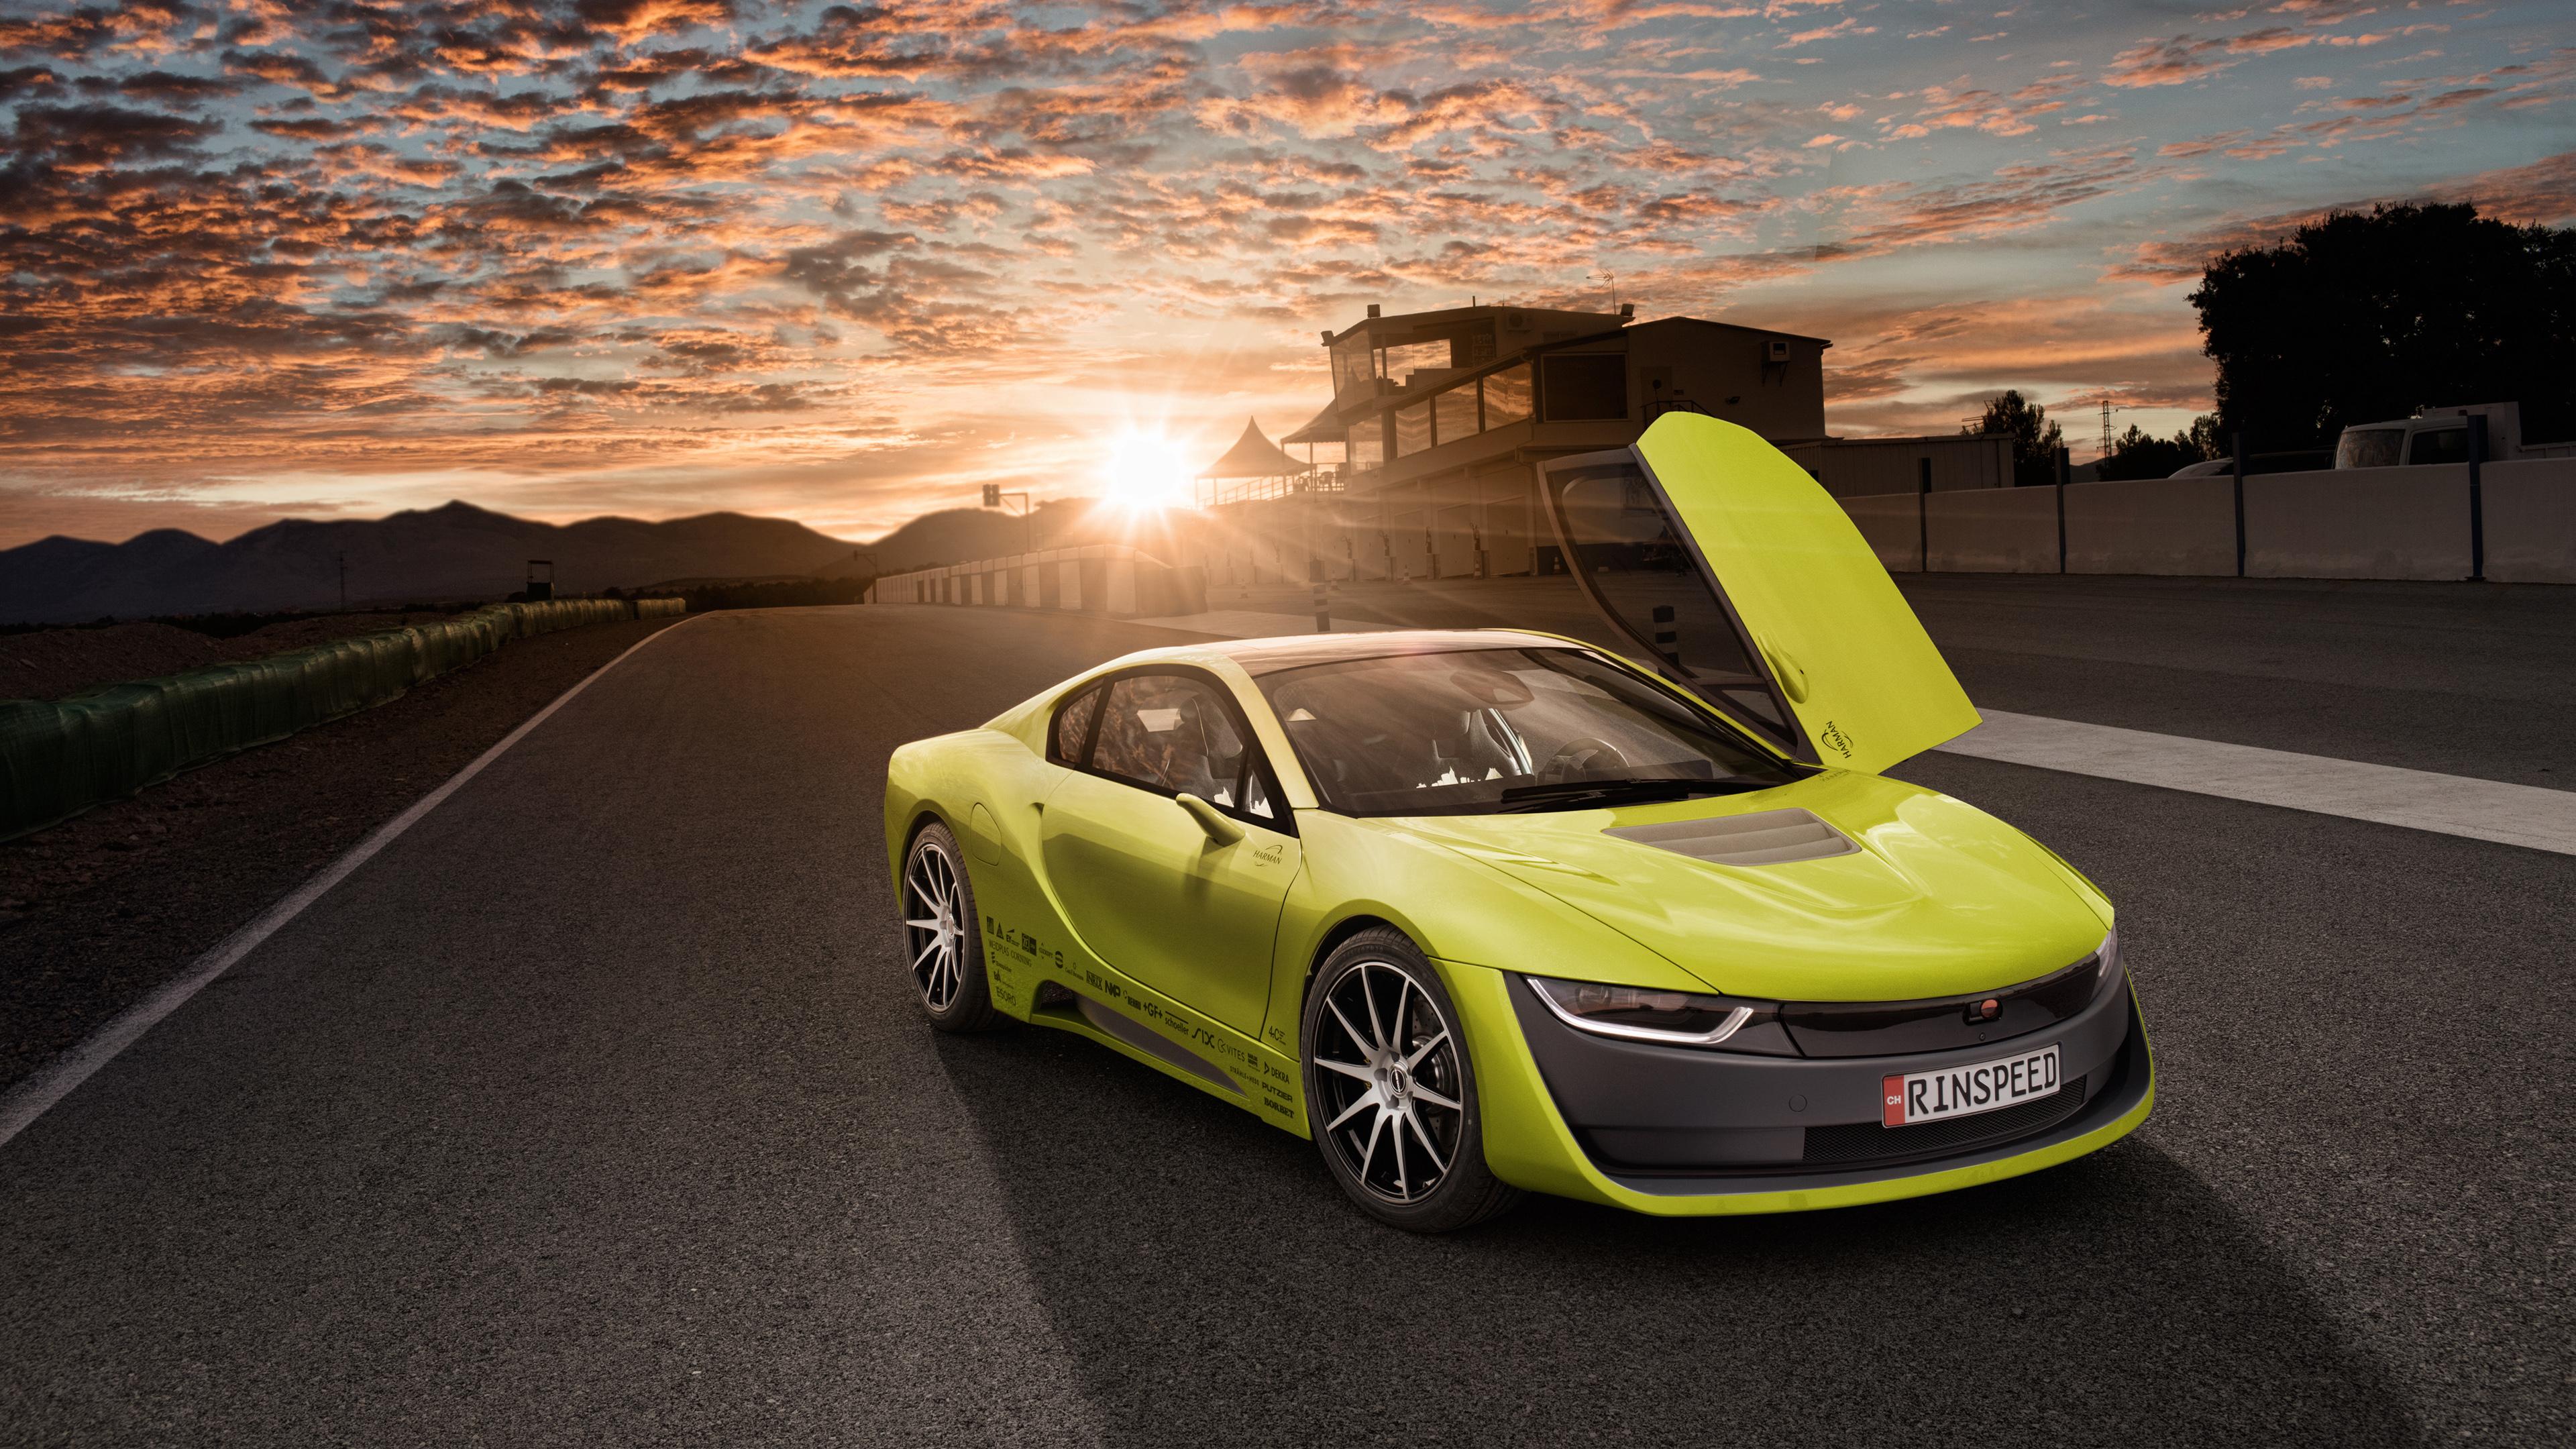 Rinspeed Etos Concept BMW I8 Self Driving Car Wallpaper